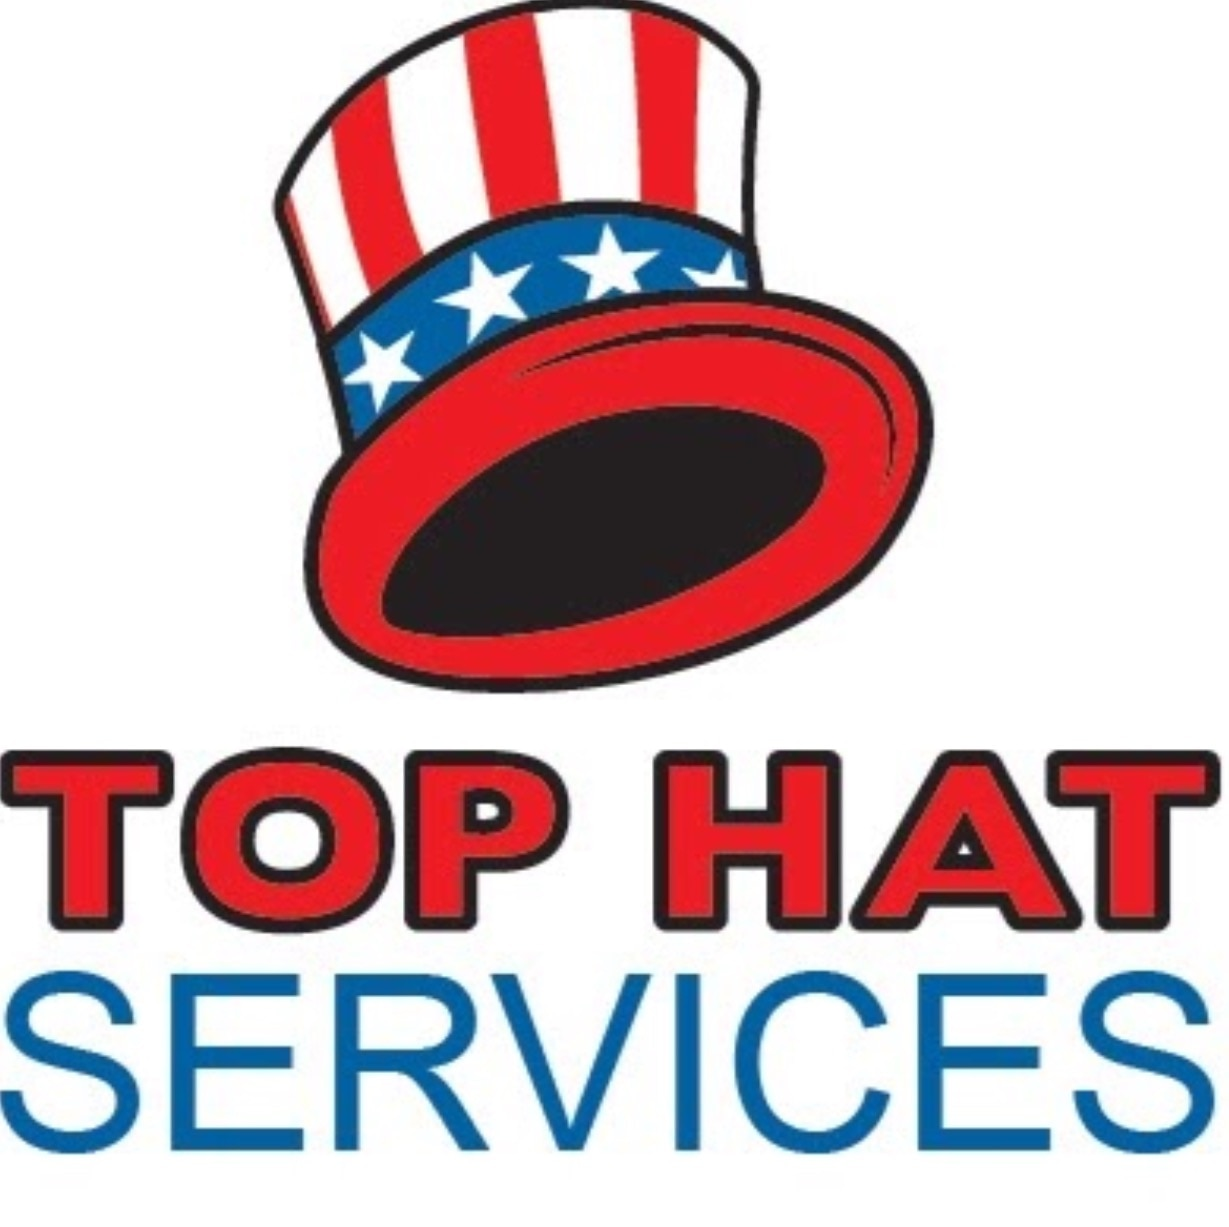 Top Hat Services logo